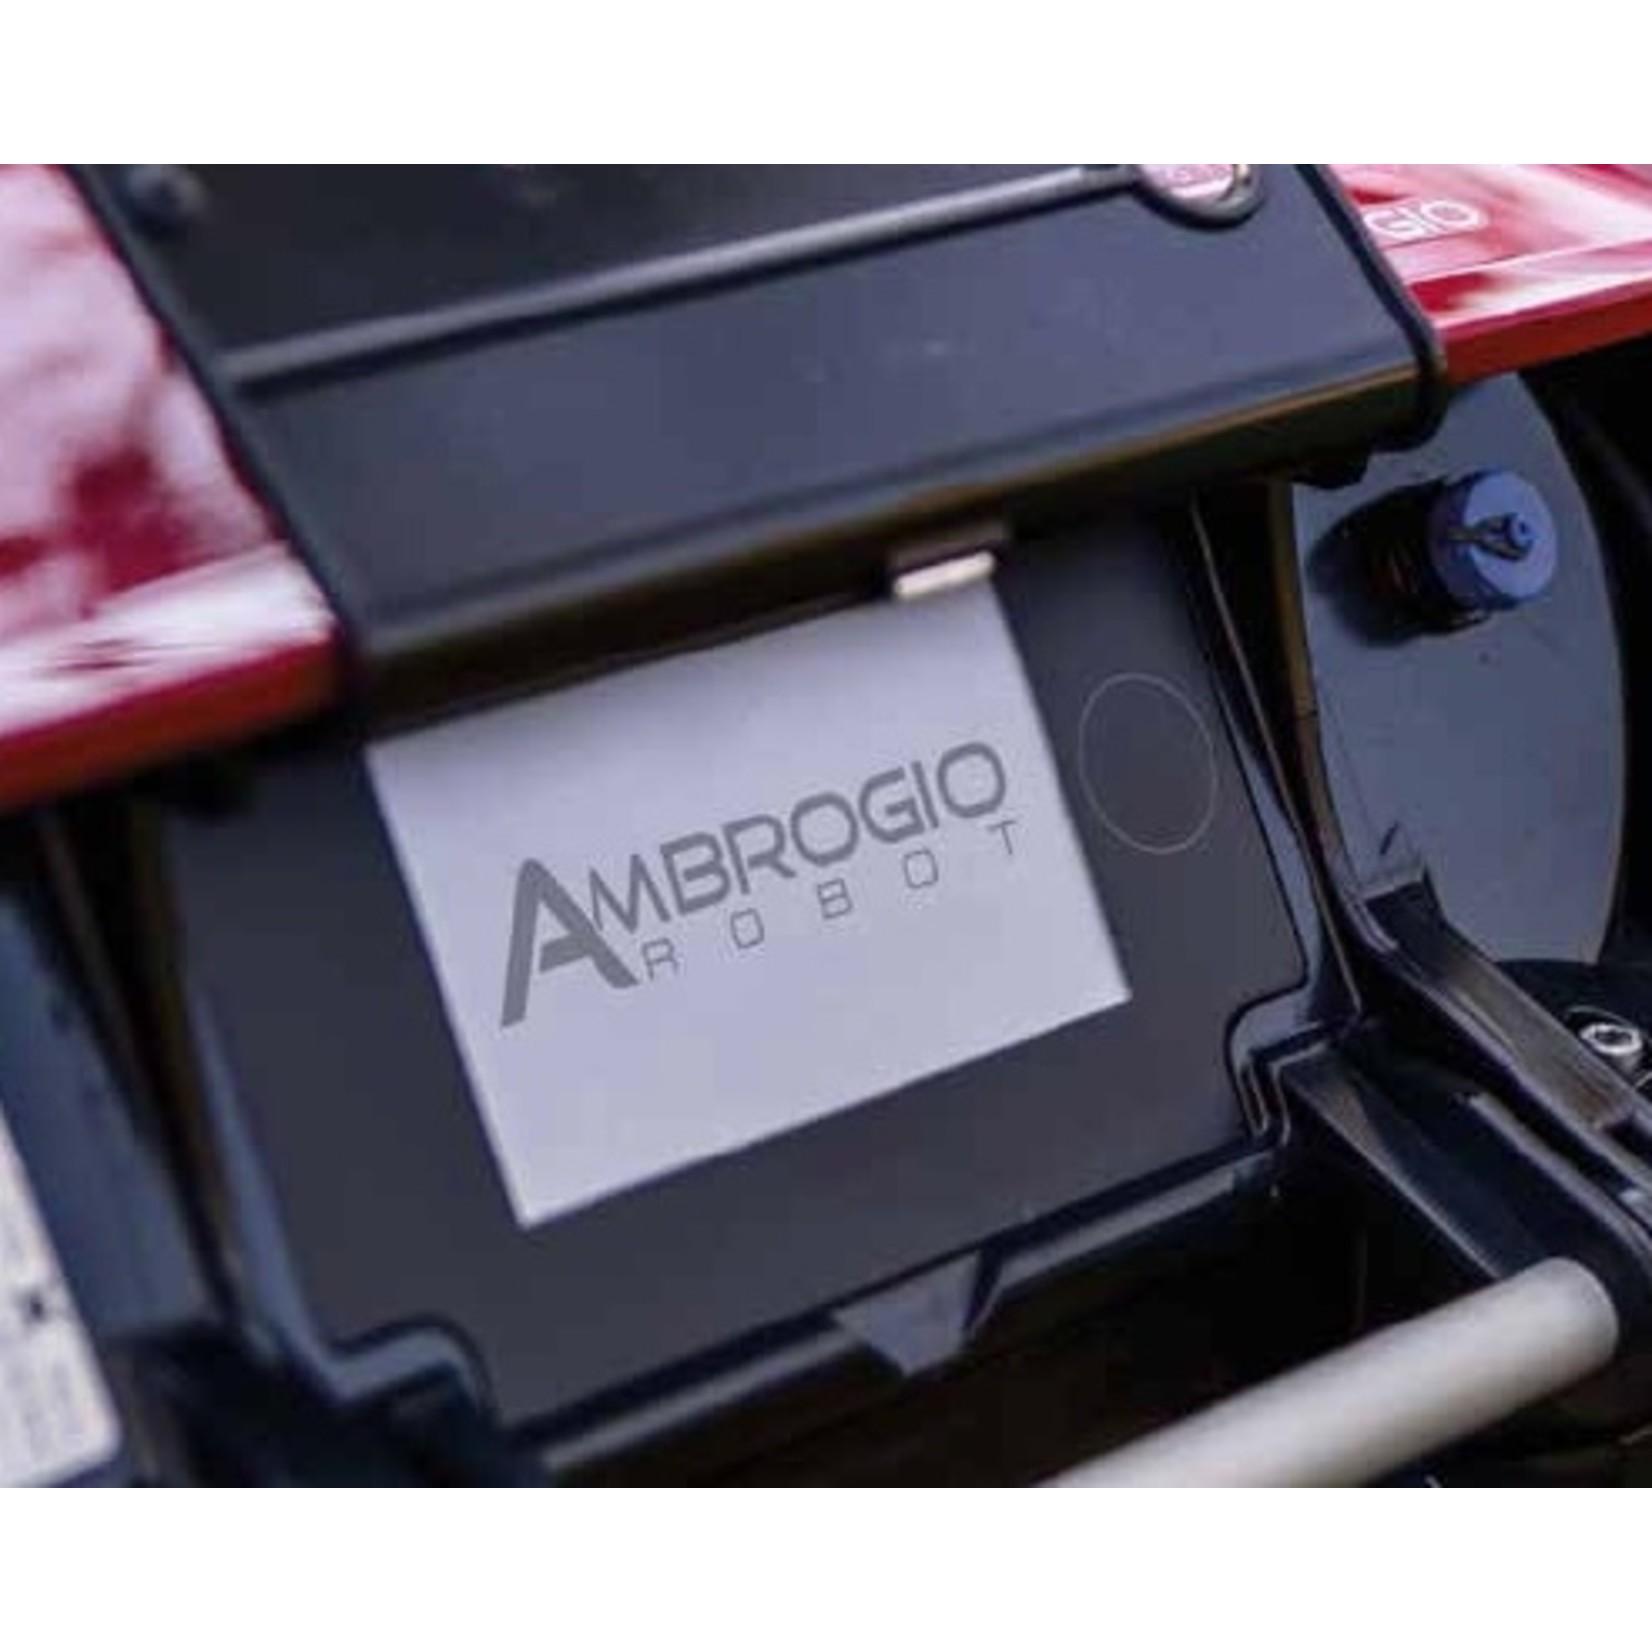 Ambrogio Ambrogio Proline L250i EliteS + Rasenmähroboter Modell 2021